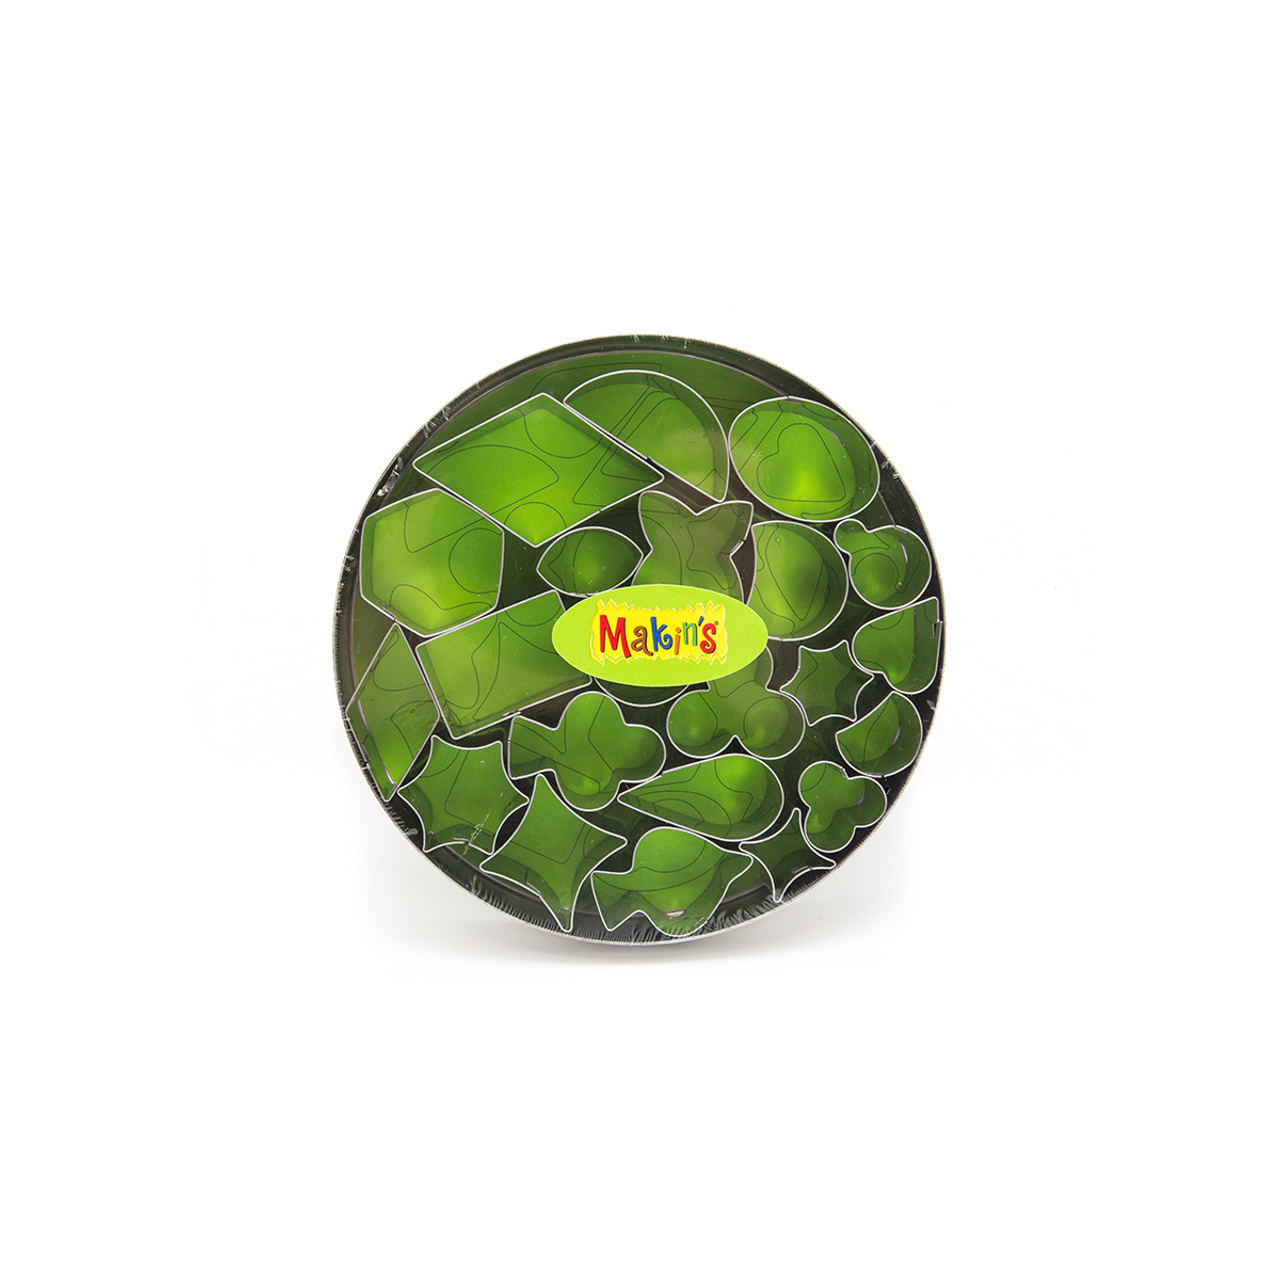 Makin's Clay Cutters- Geometric - Set of 22